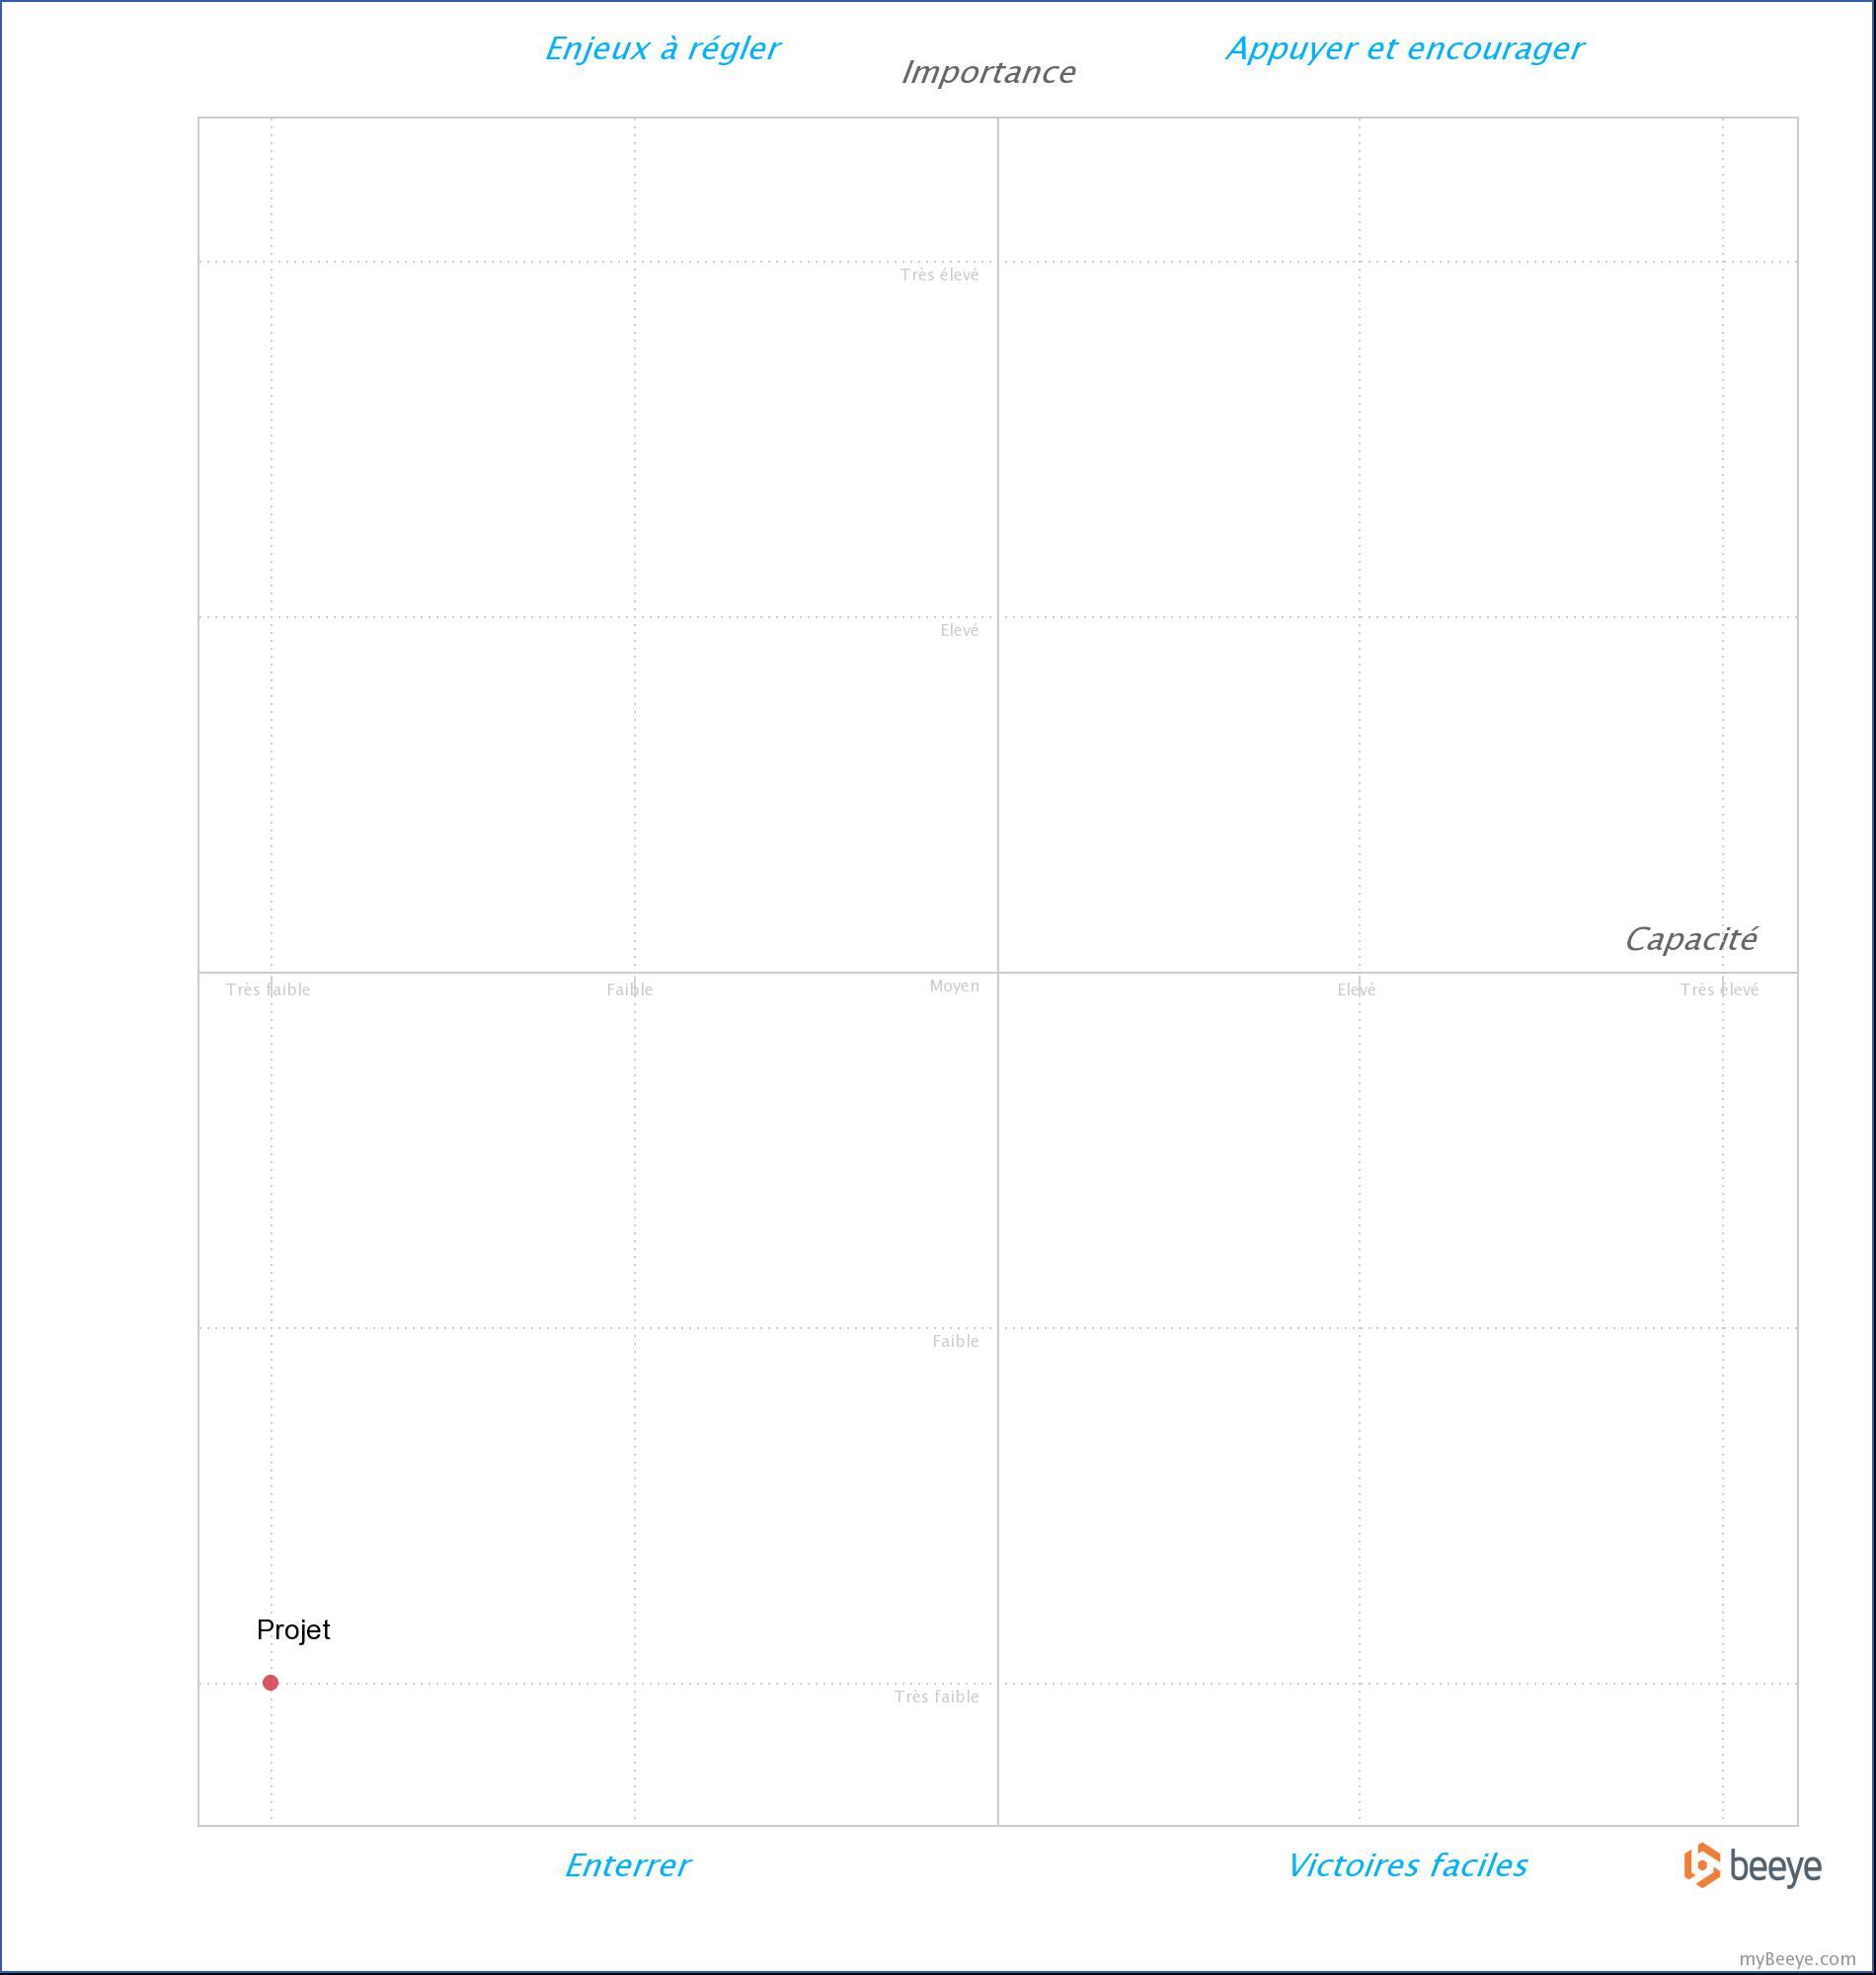 gestion portefeuille projet : matrice de priorisation projet